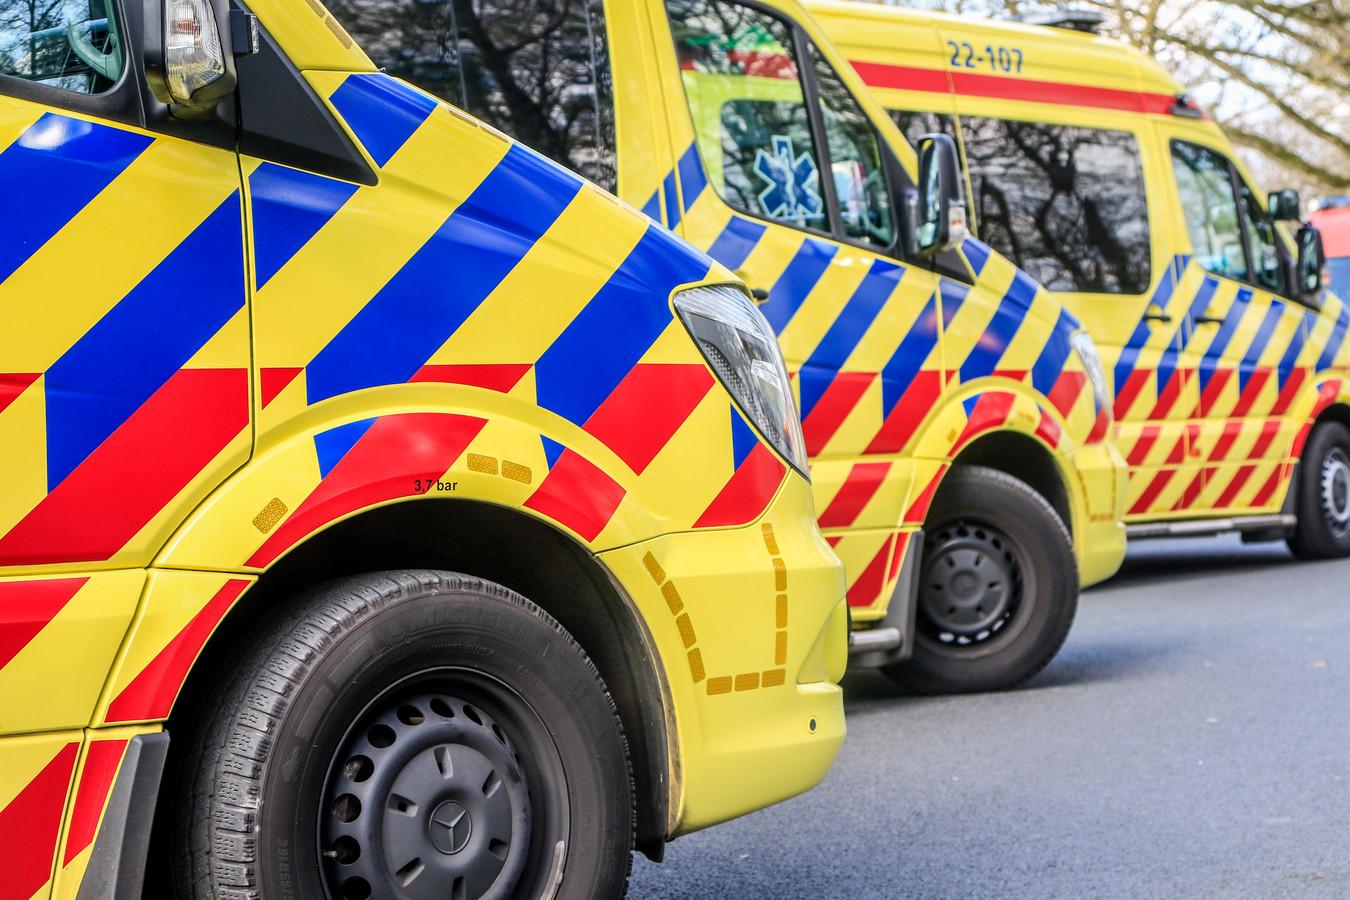 Meer ritten in West Maas en Waal, maar ook vaker te laat.